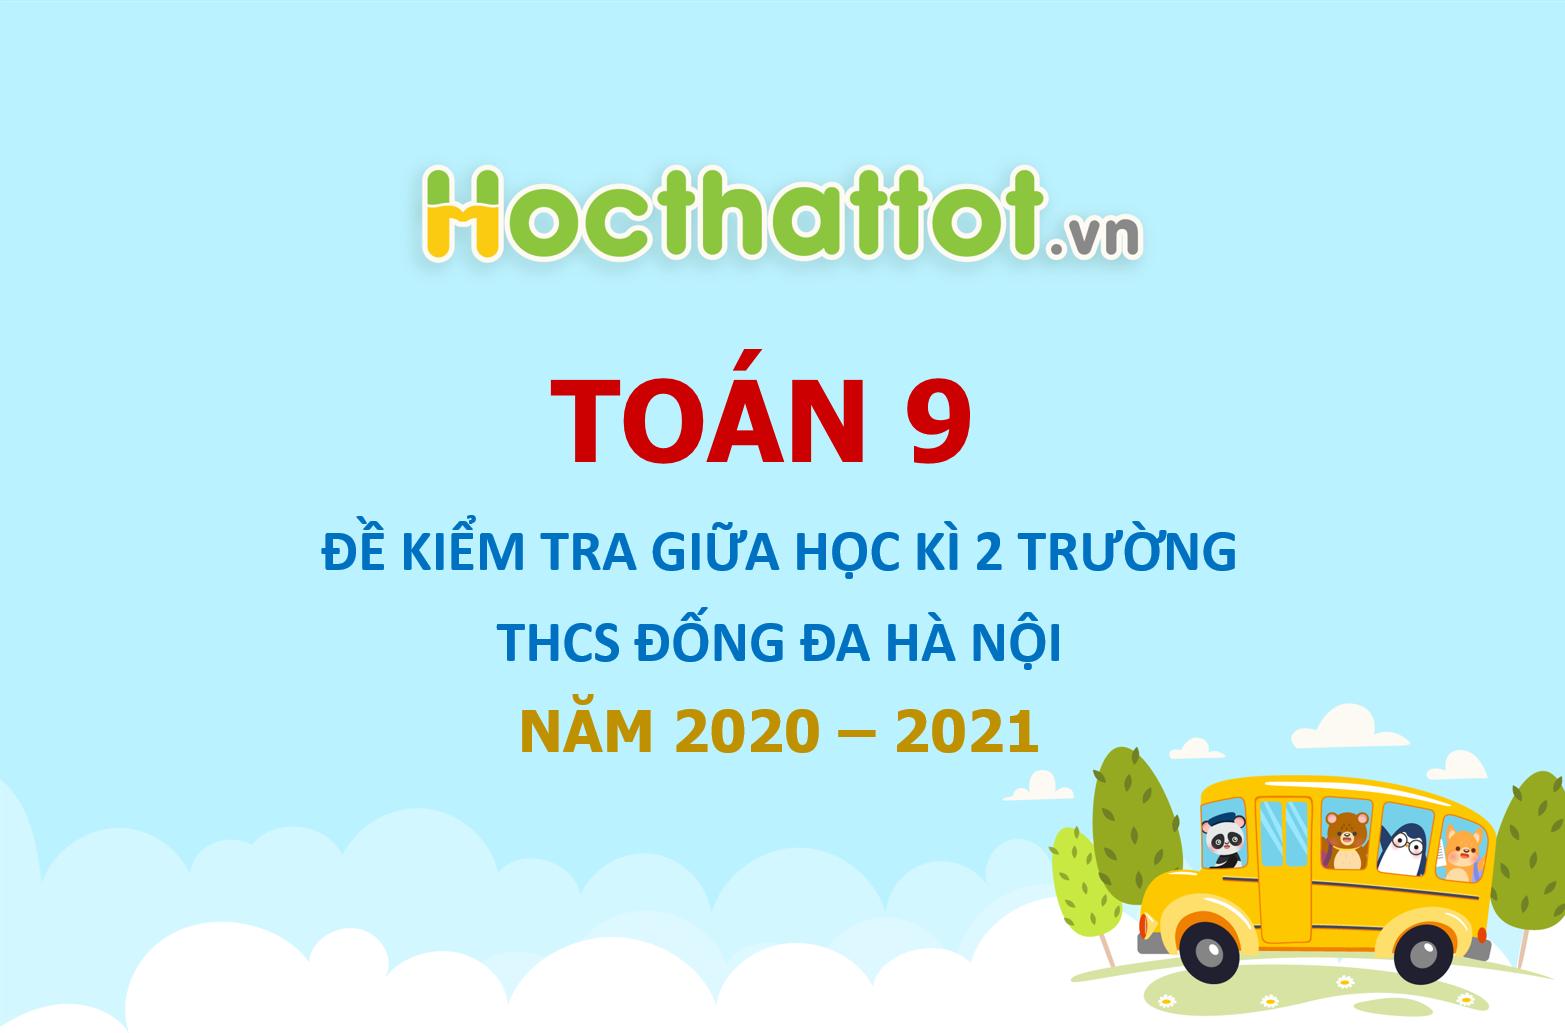 de-thi-giua-ki-2-toan-9-nam-2020-2021-truong-thcs-dong-da-ha-noi